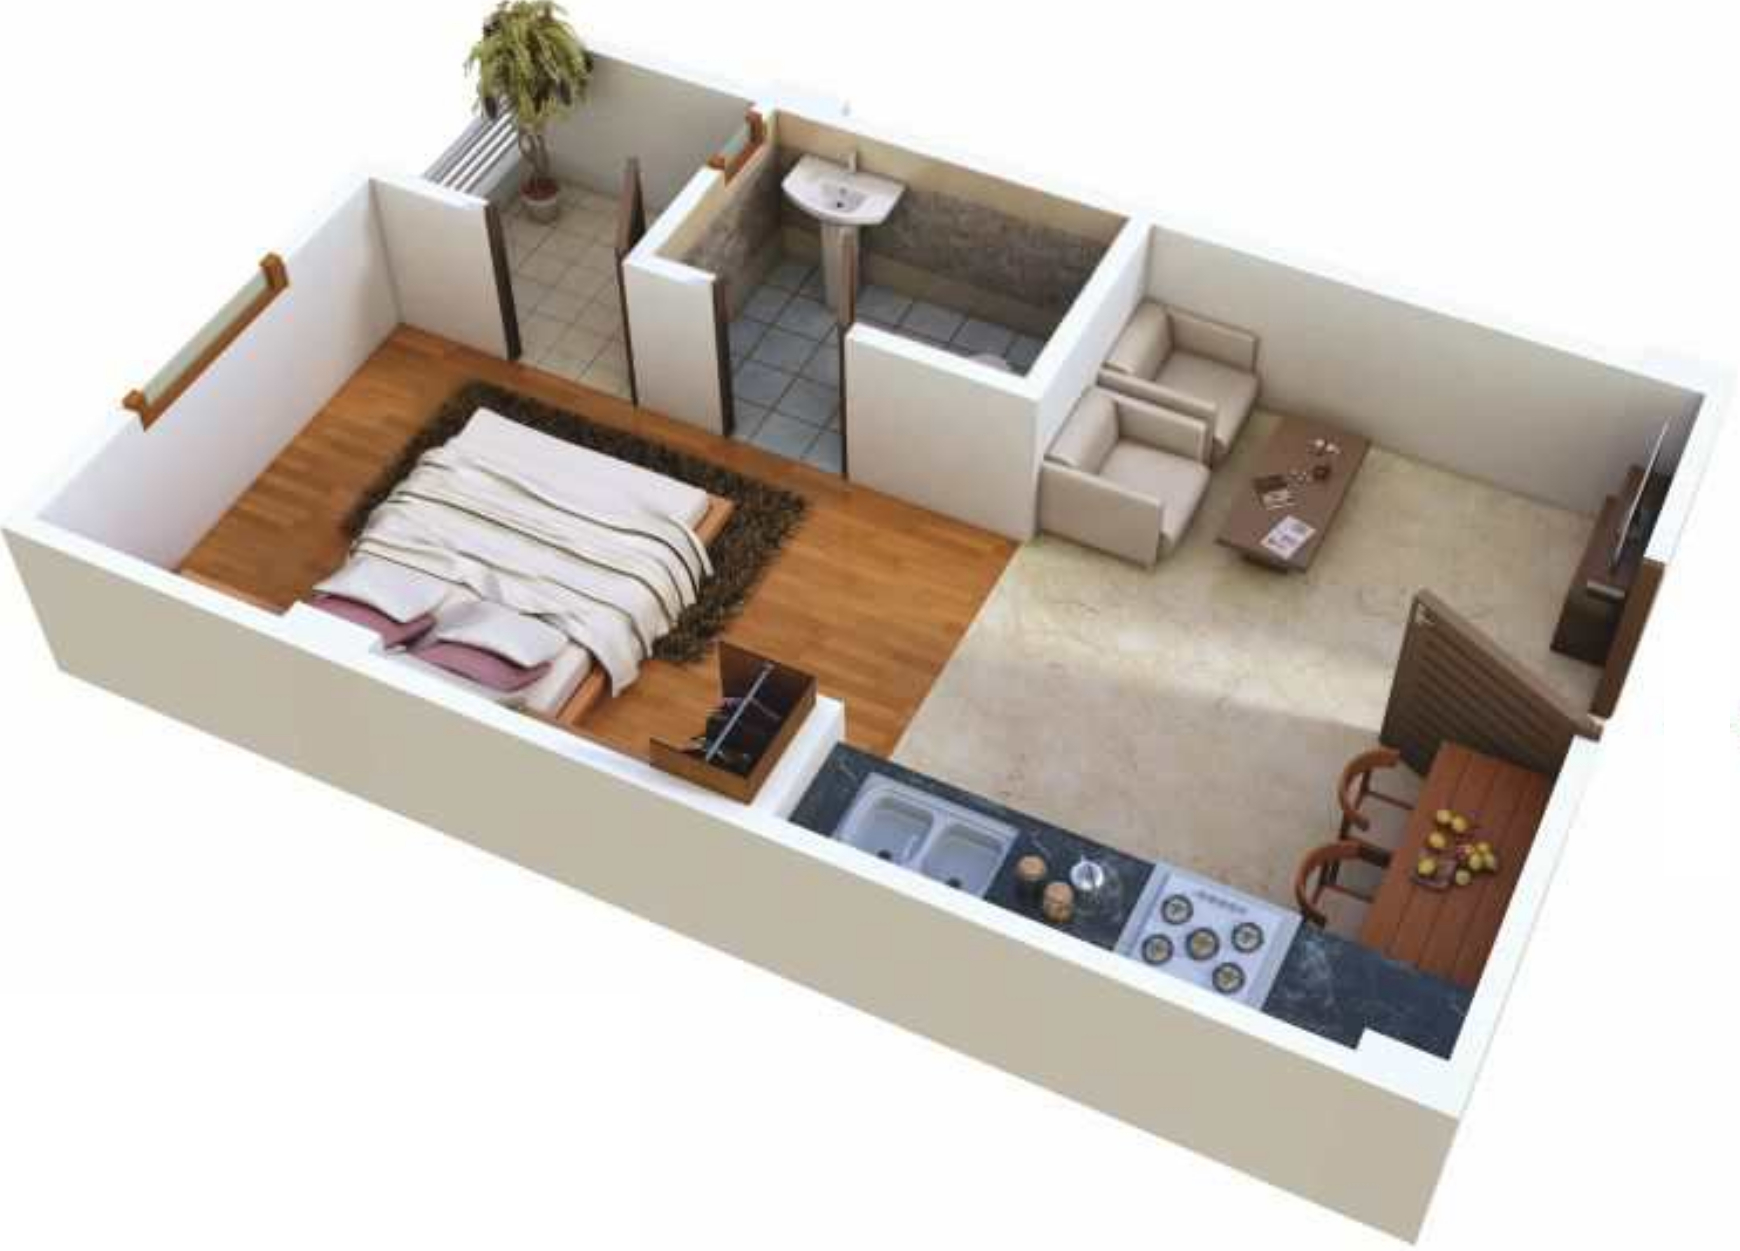 400 sq ft house plans in chennai arts 400 sq ft house plans in chennai